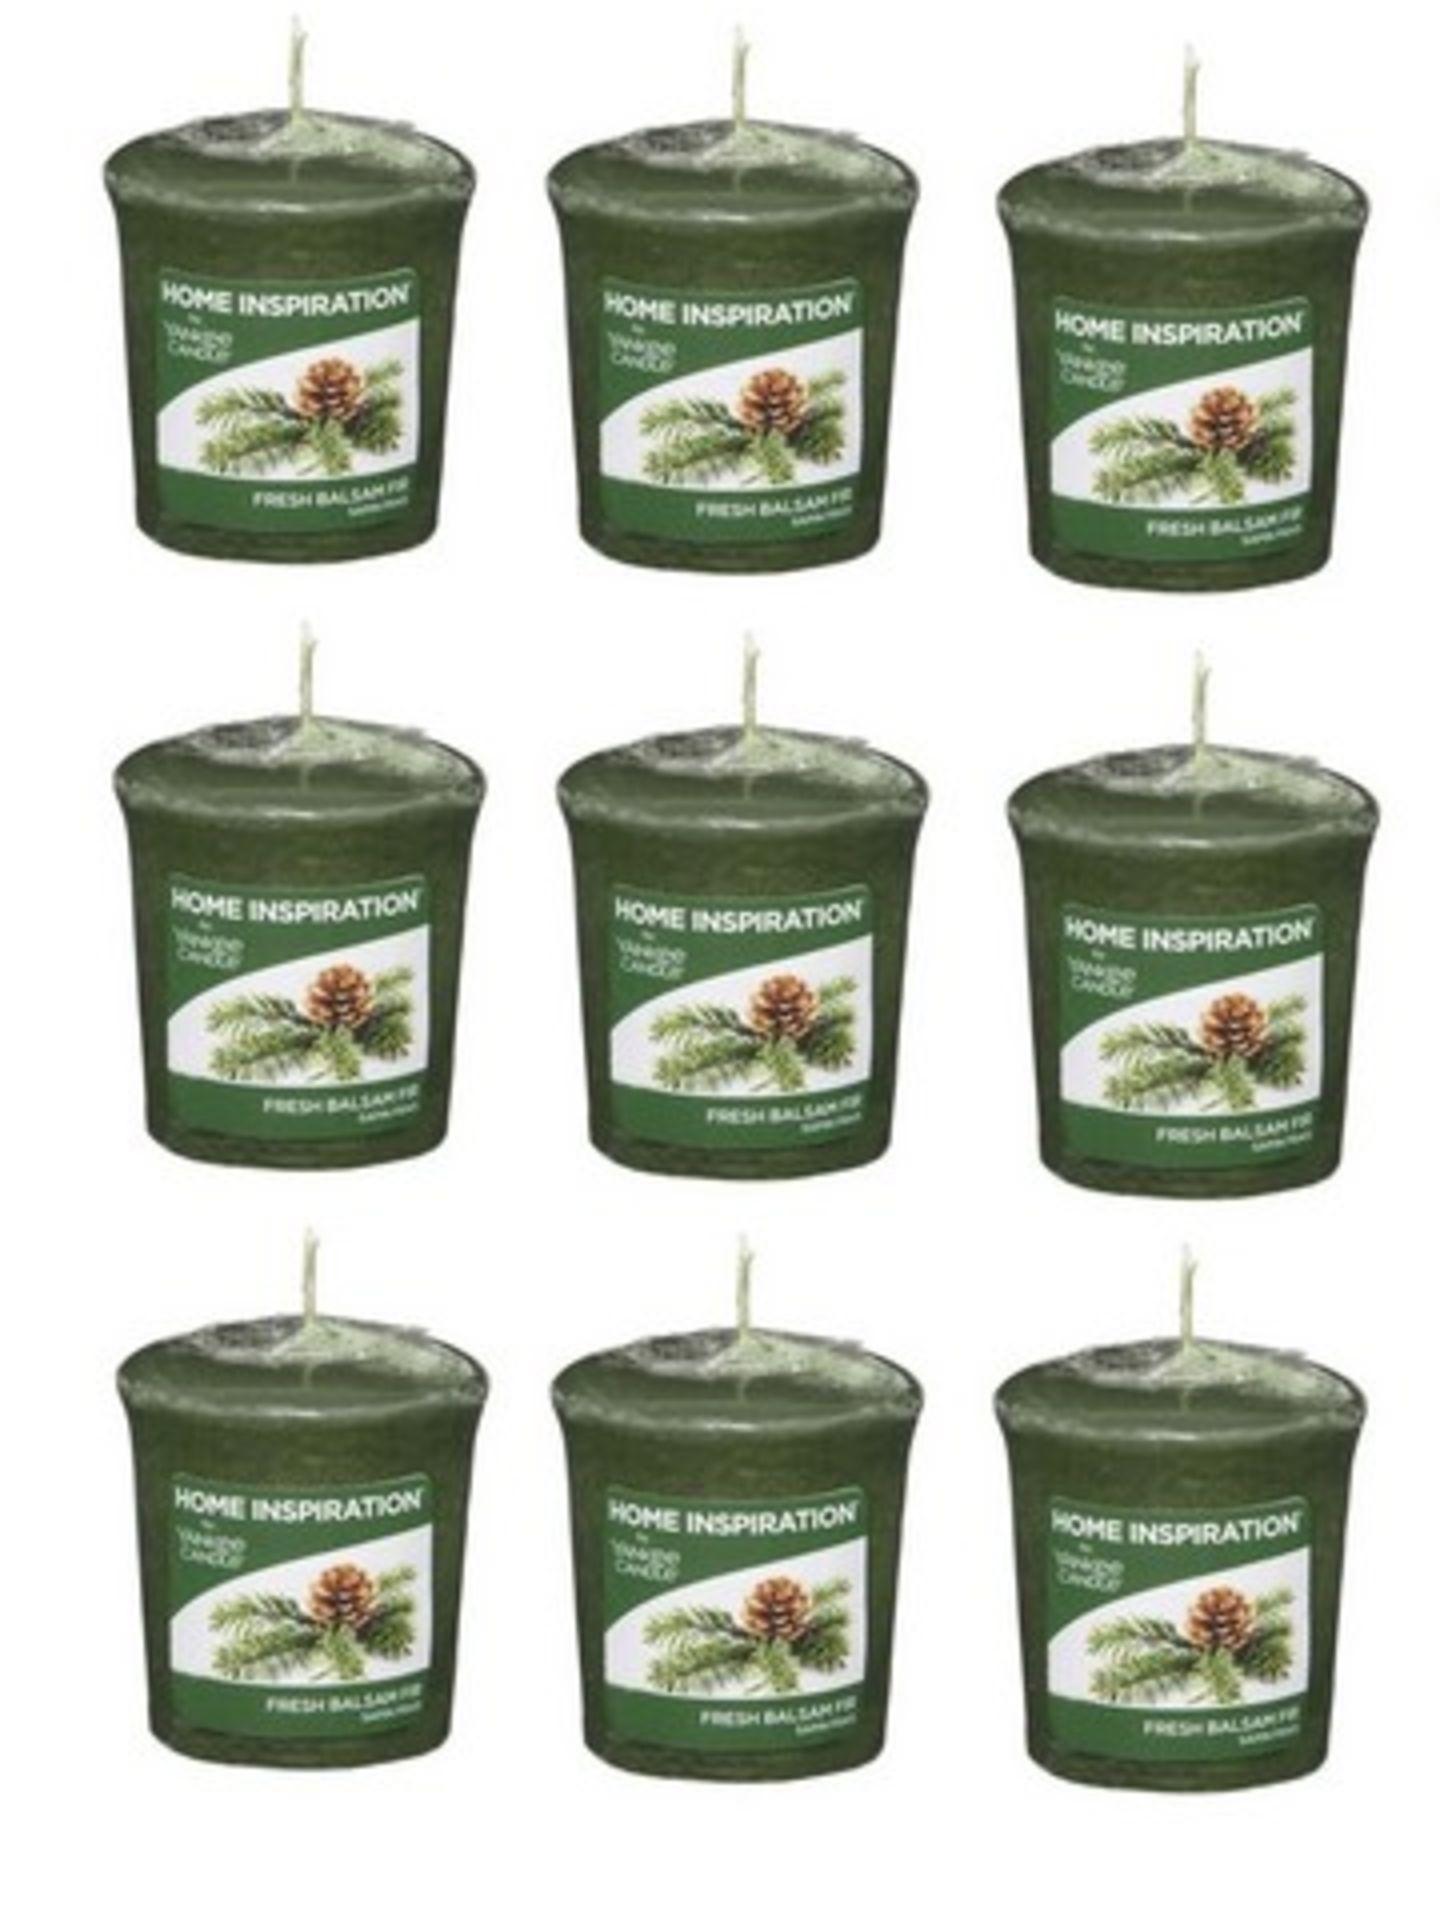 Lot 51504 - V Brand New 9 x Yankee Candle Votive Fresh Balsam Fir - Internet Price £17.91 (Thestore91)